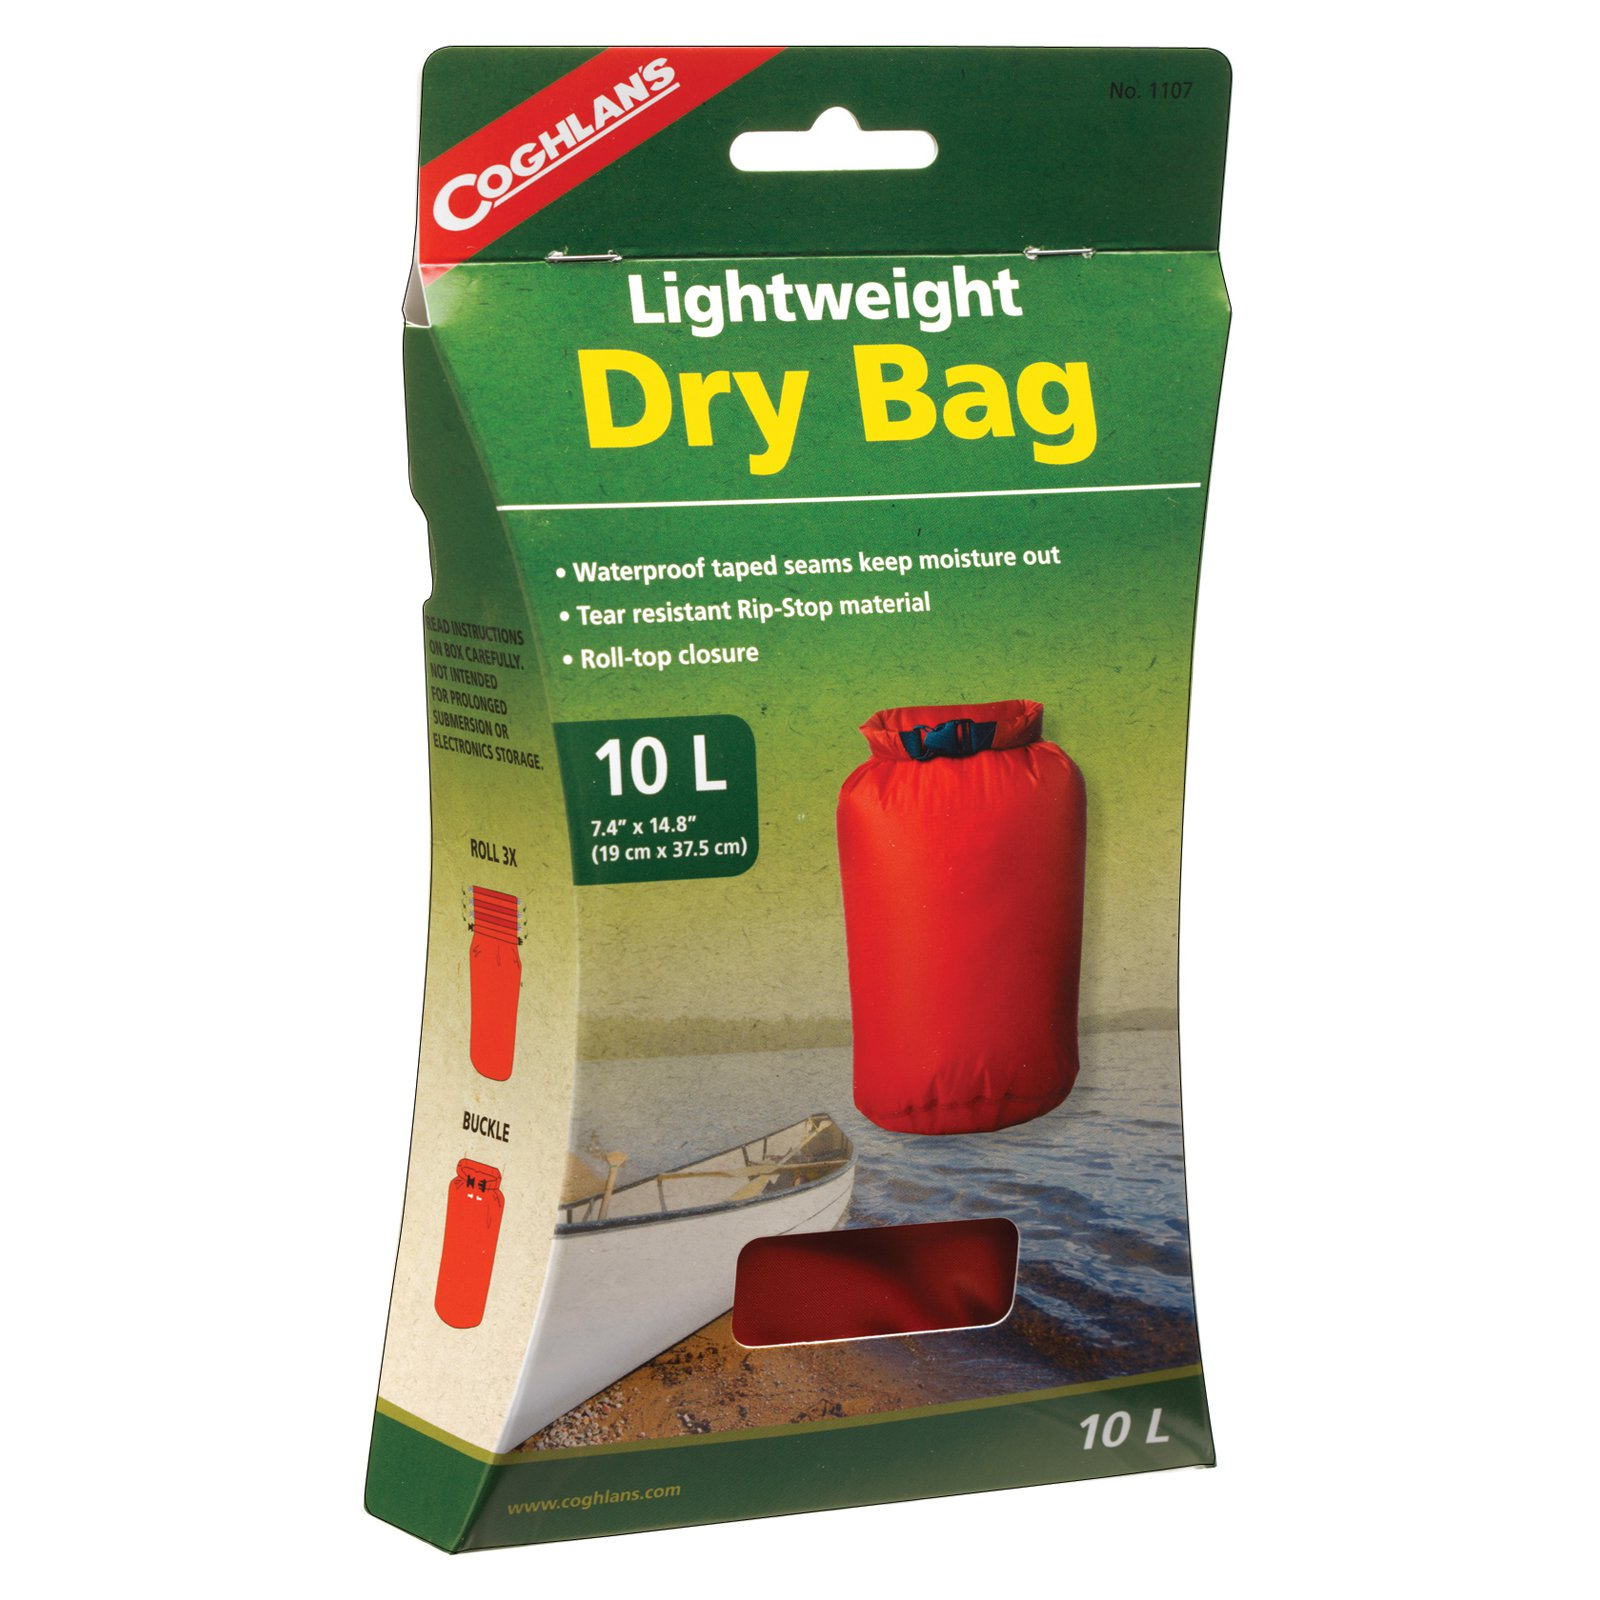 Coghlan's 1107 10 Liter Lightweight Dry Bag